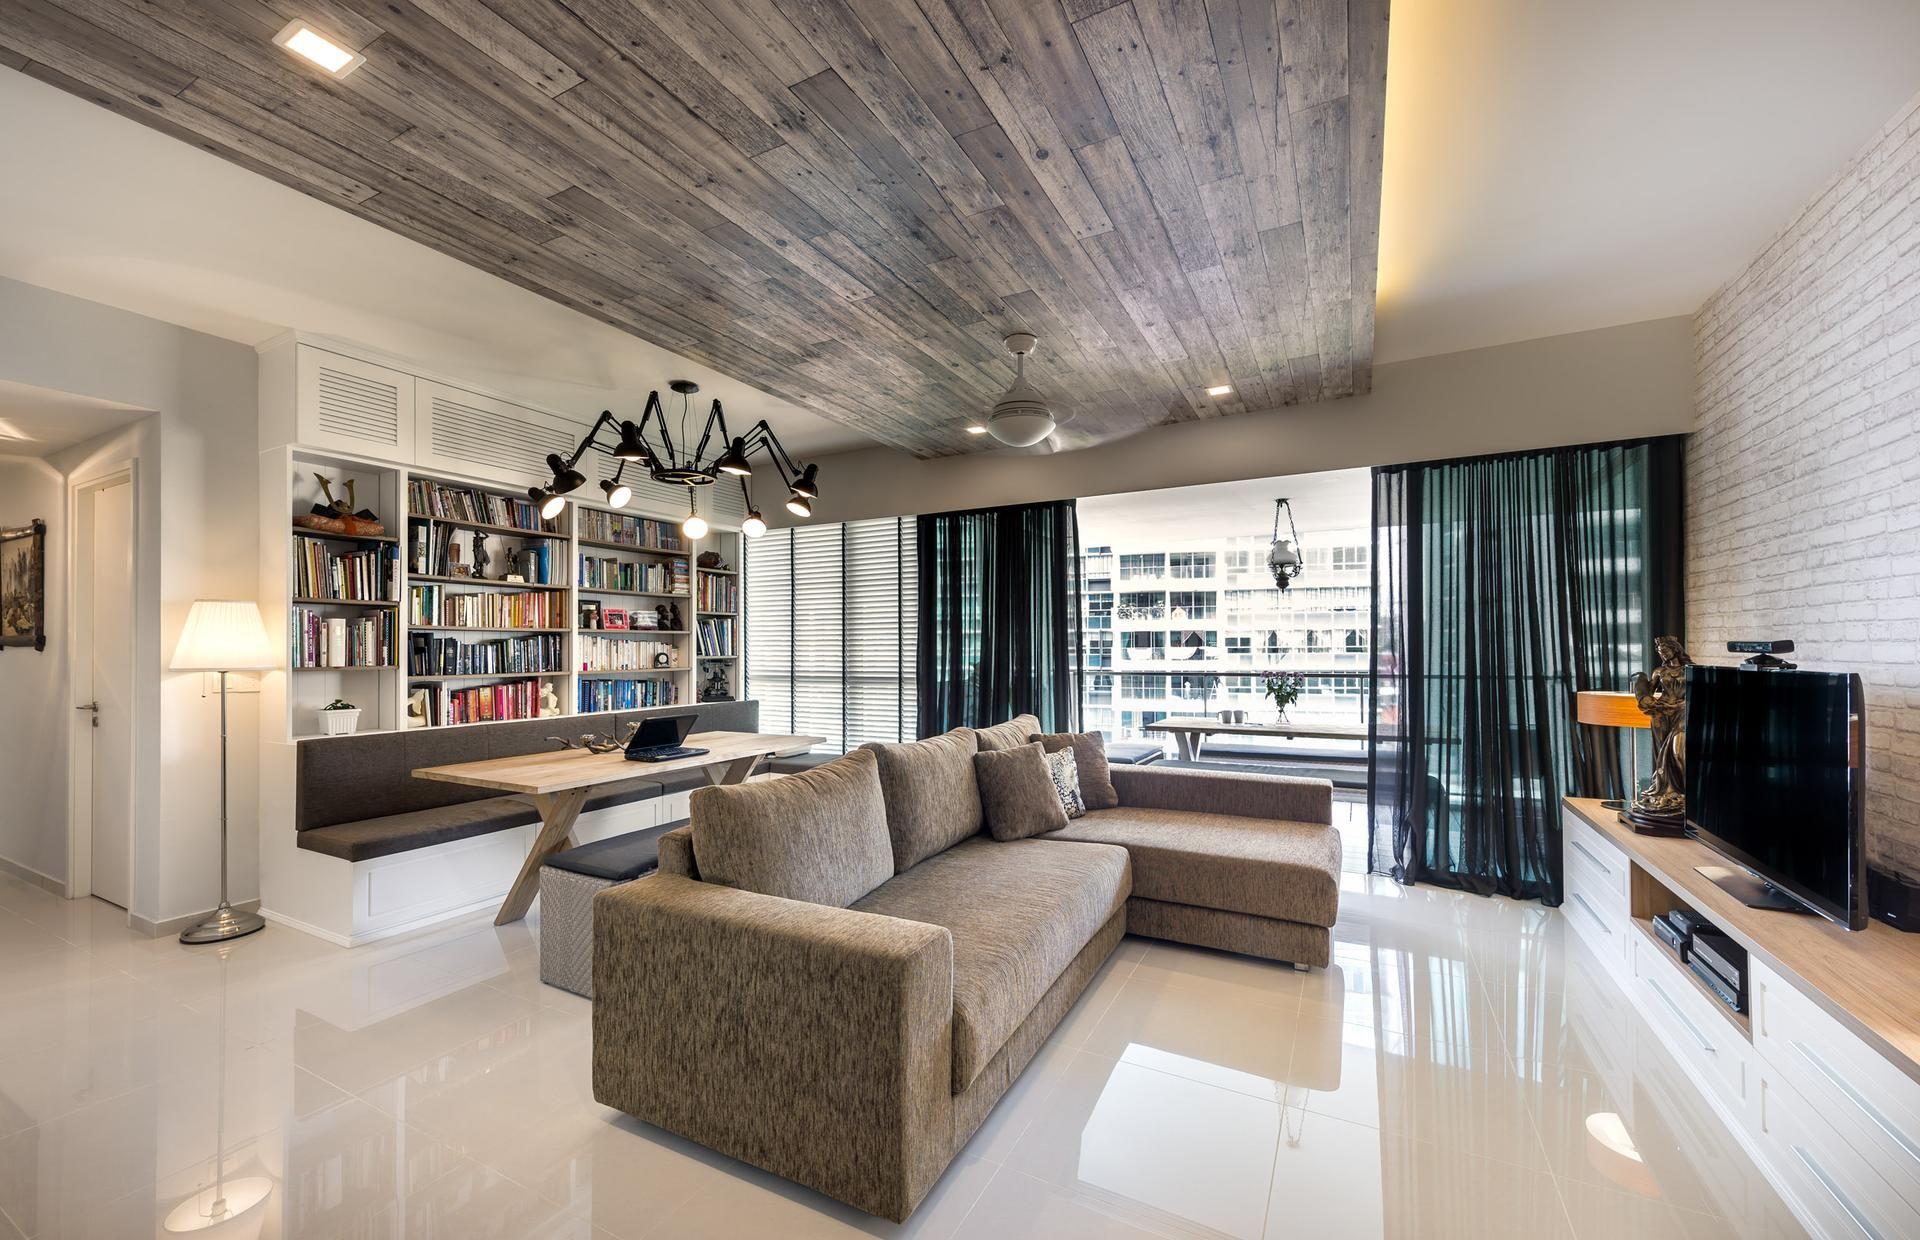 The minton qanvast home design renovation remodelling furnishing ideas